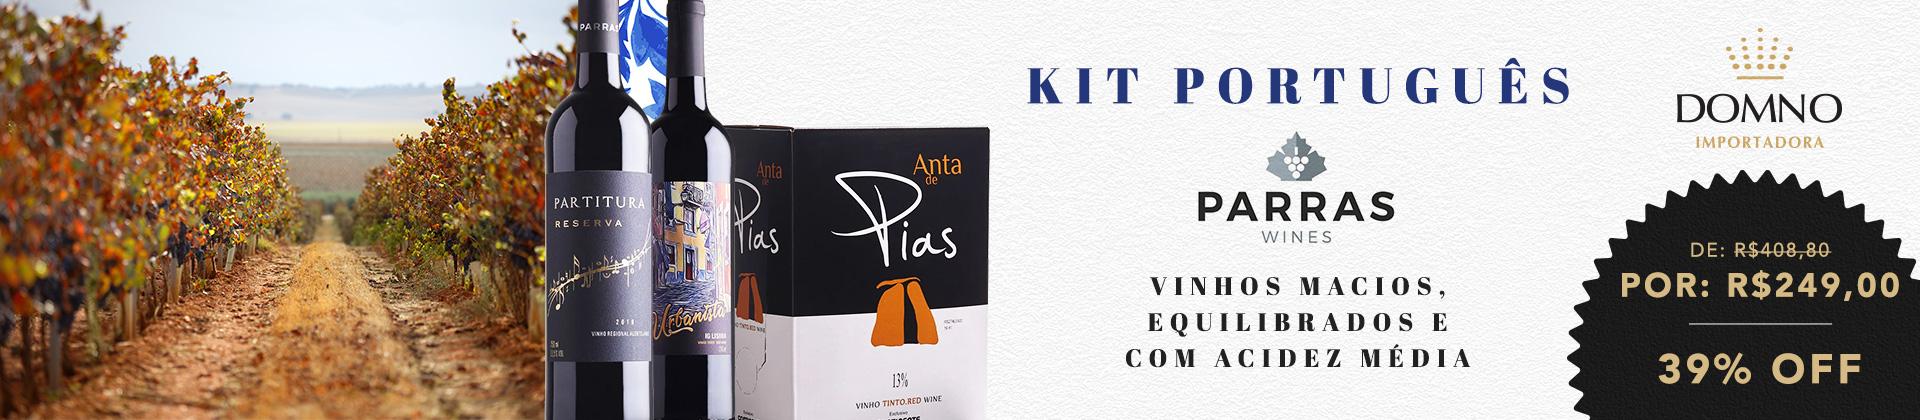 Parras Wines (1920x420)